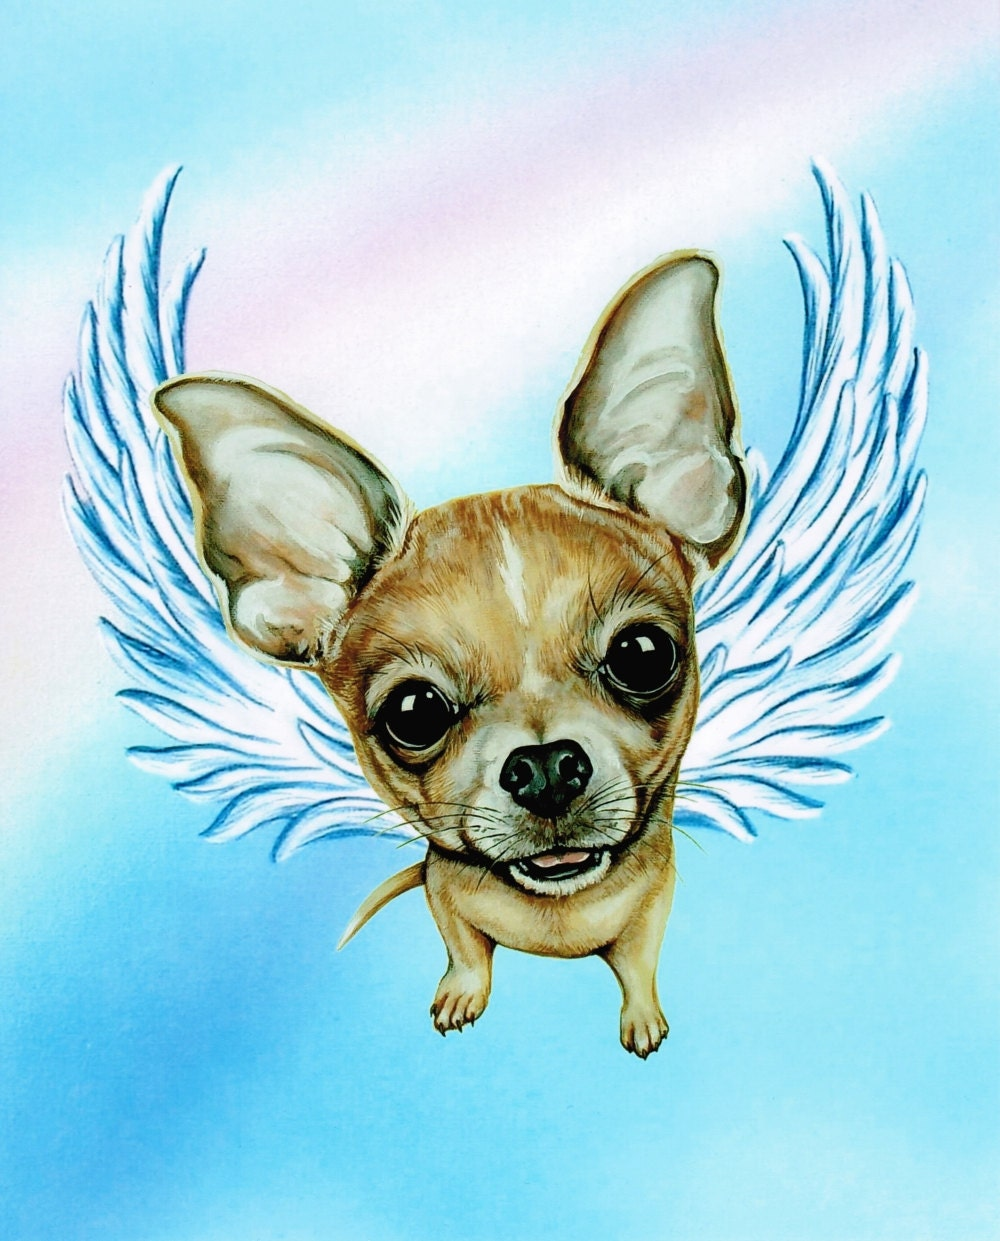 Chihuahua Angel Chihuahua Chihuahua Memorial By Artbyweeze